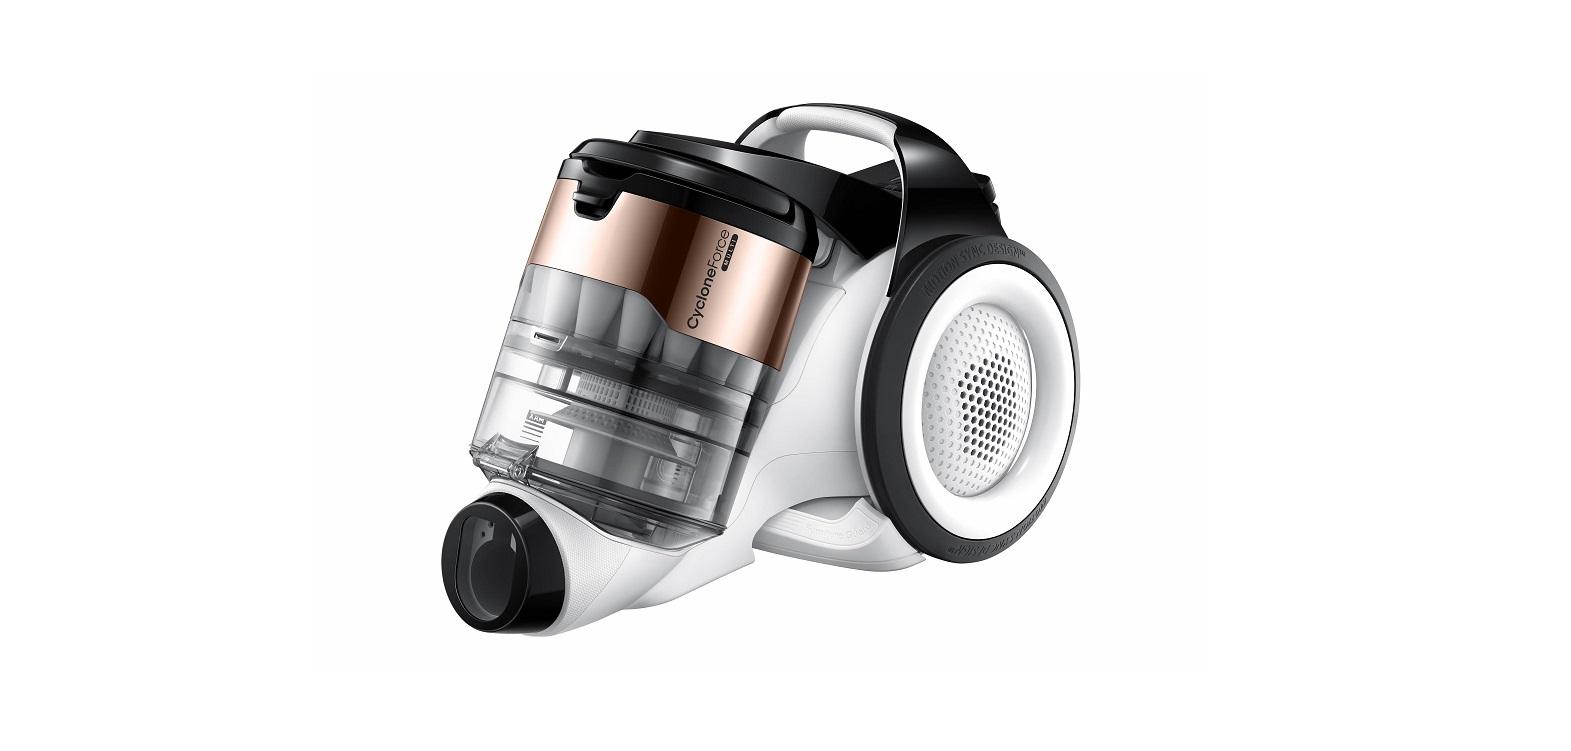 Samsung Cylinder Vacuum Cleaner (Bagless)